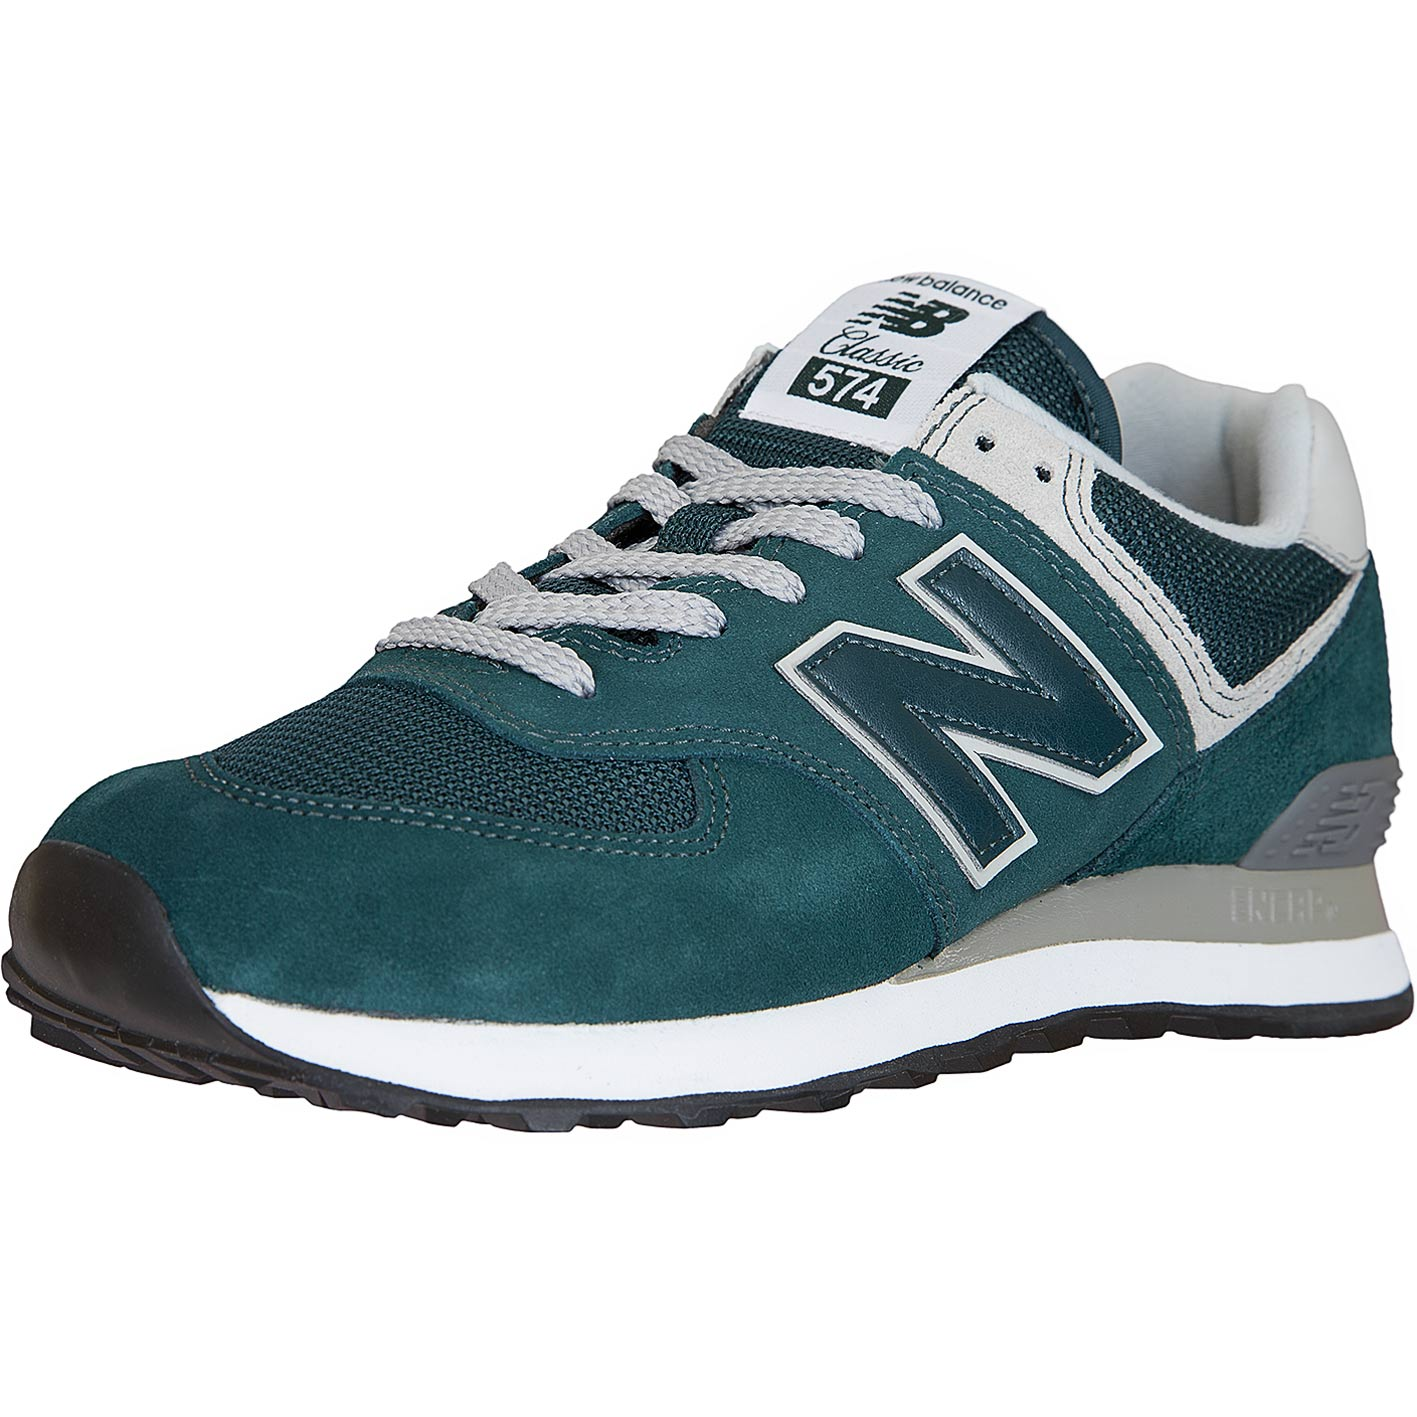 promo code f10da ff145 New Balance Sneaker 574 Leder/Textil/PU grün